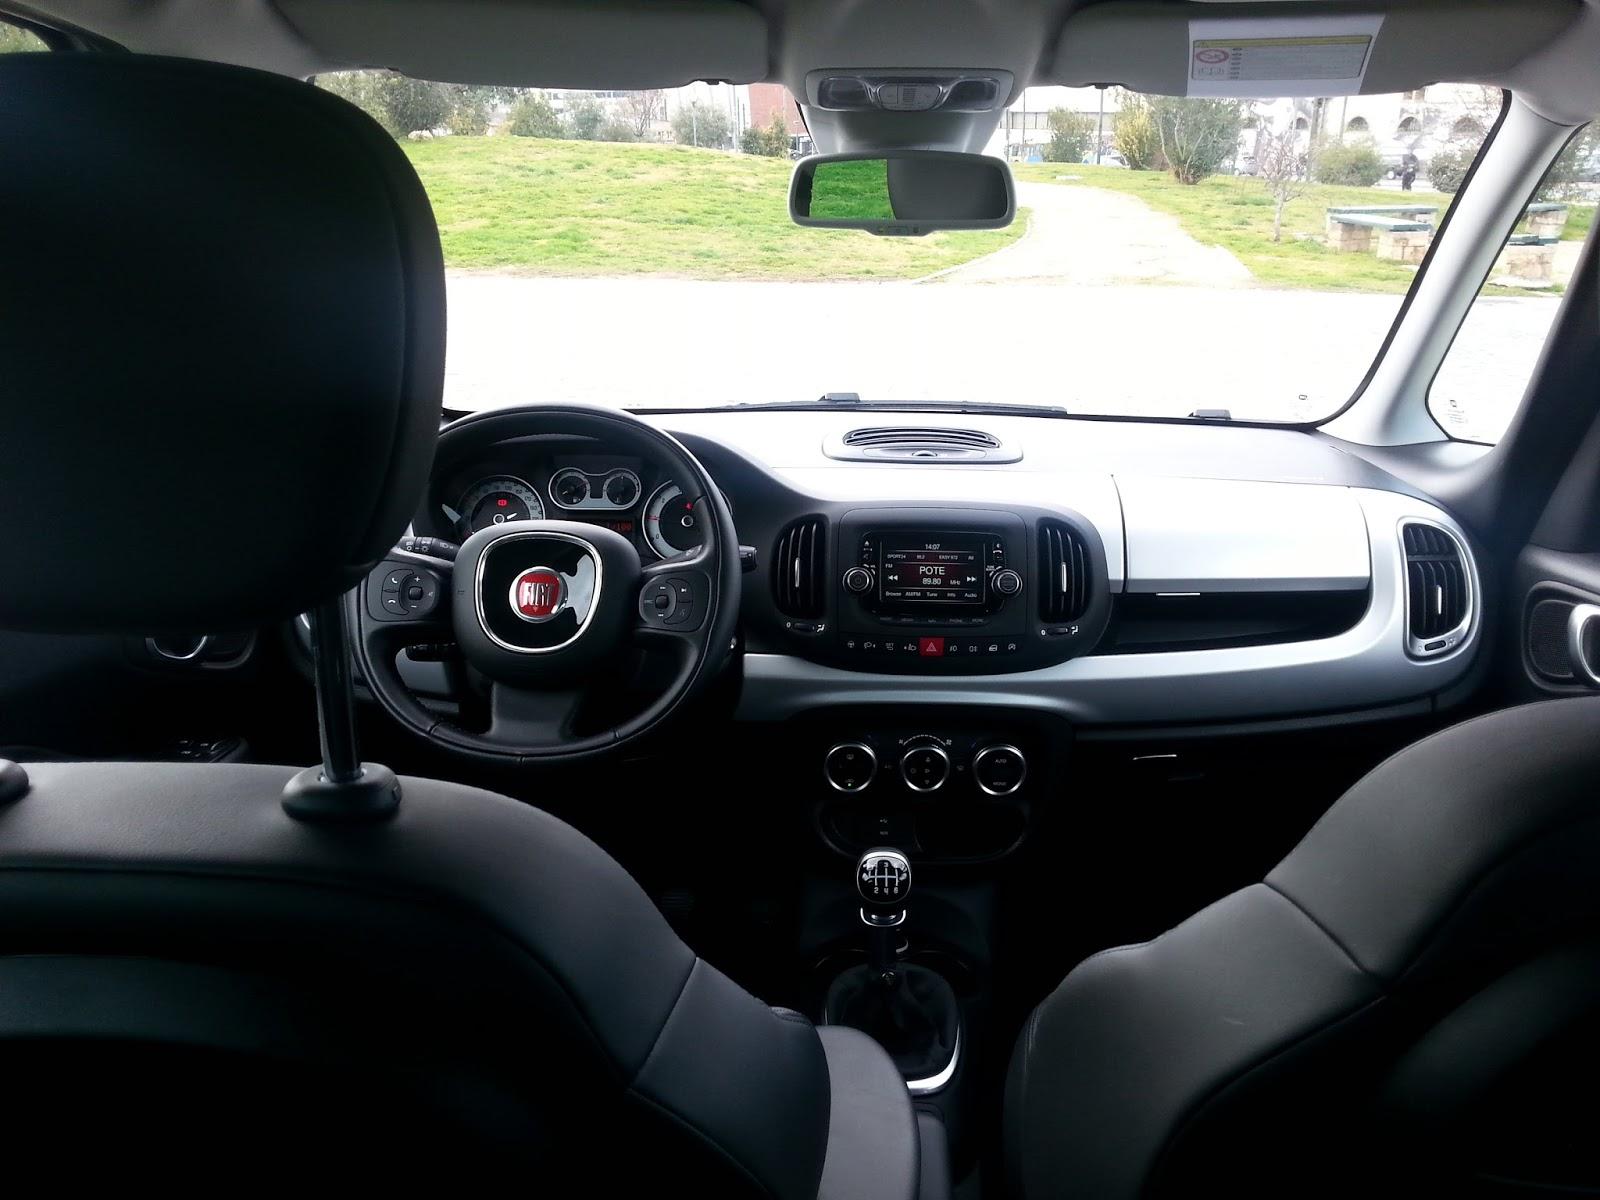 F3 Πόσο... Trekking είναι το Fiat 500L Trekking; Fiat 500L Trekking, TEST, ΔΟΚΙΜΕΣ